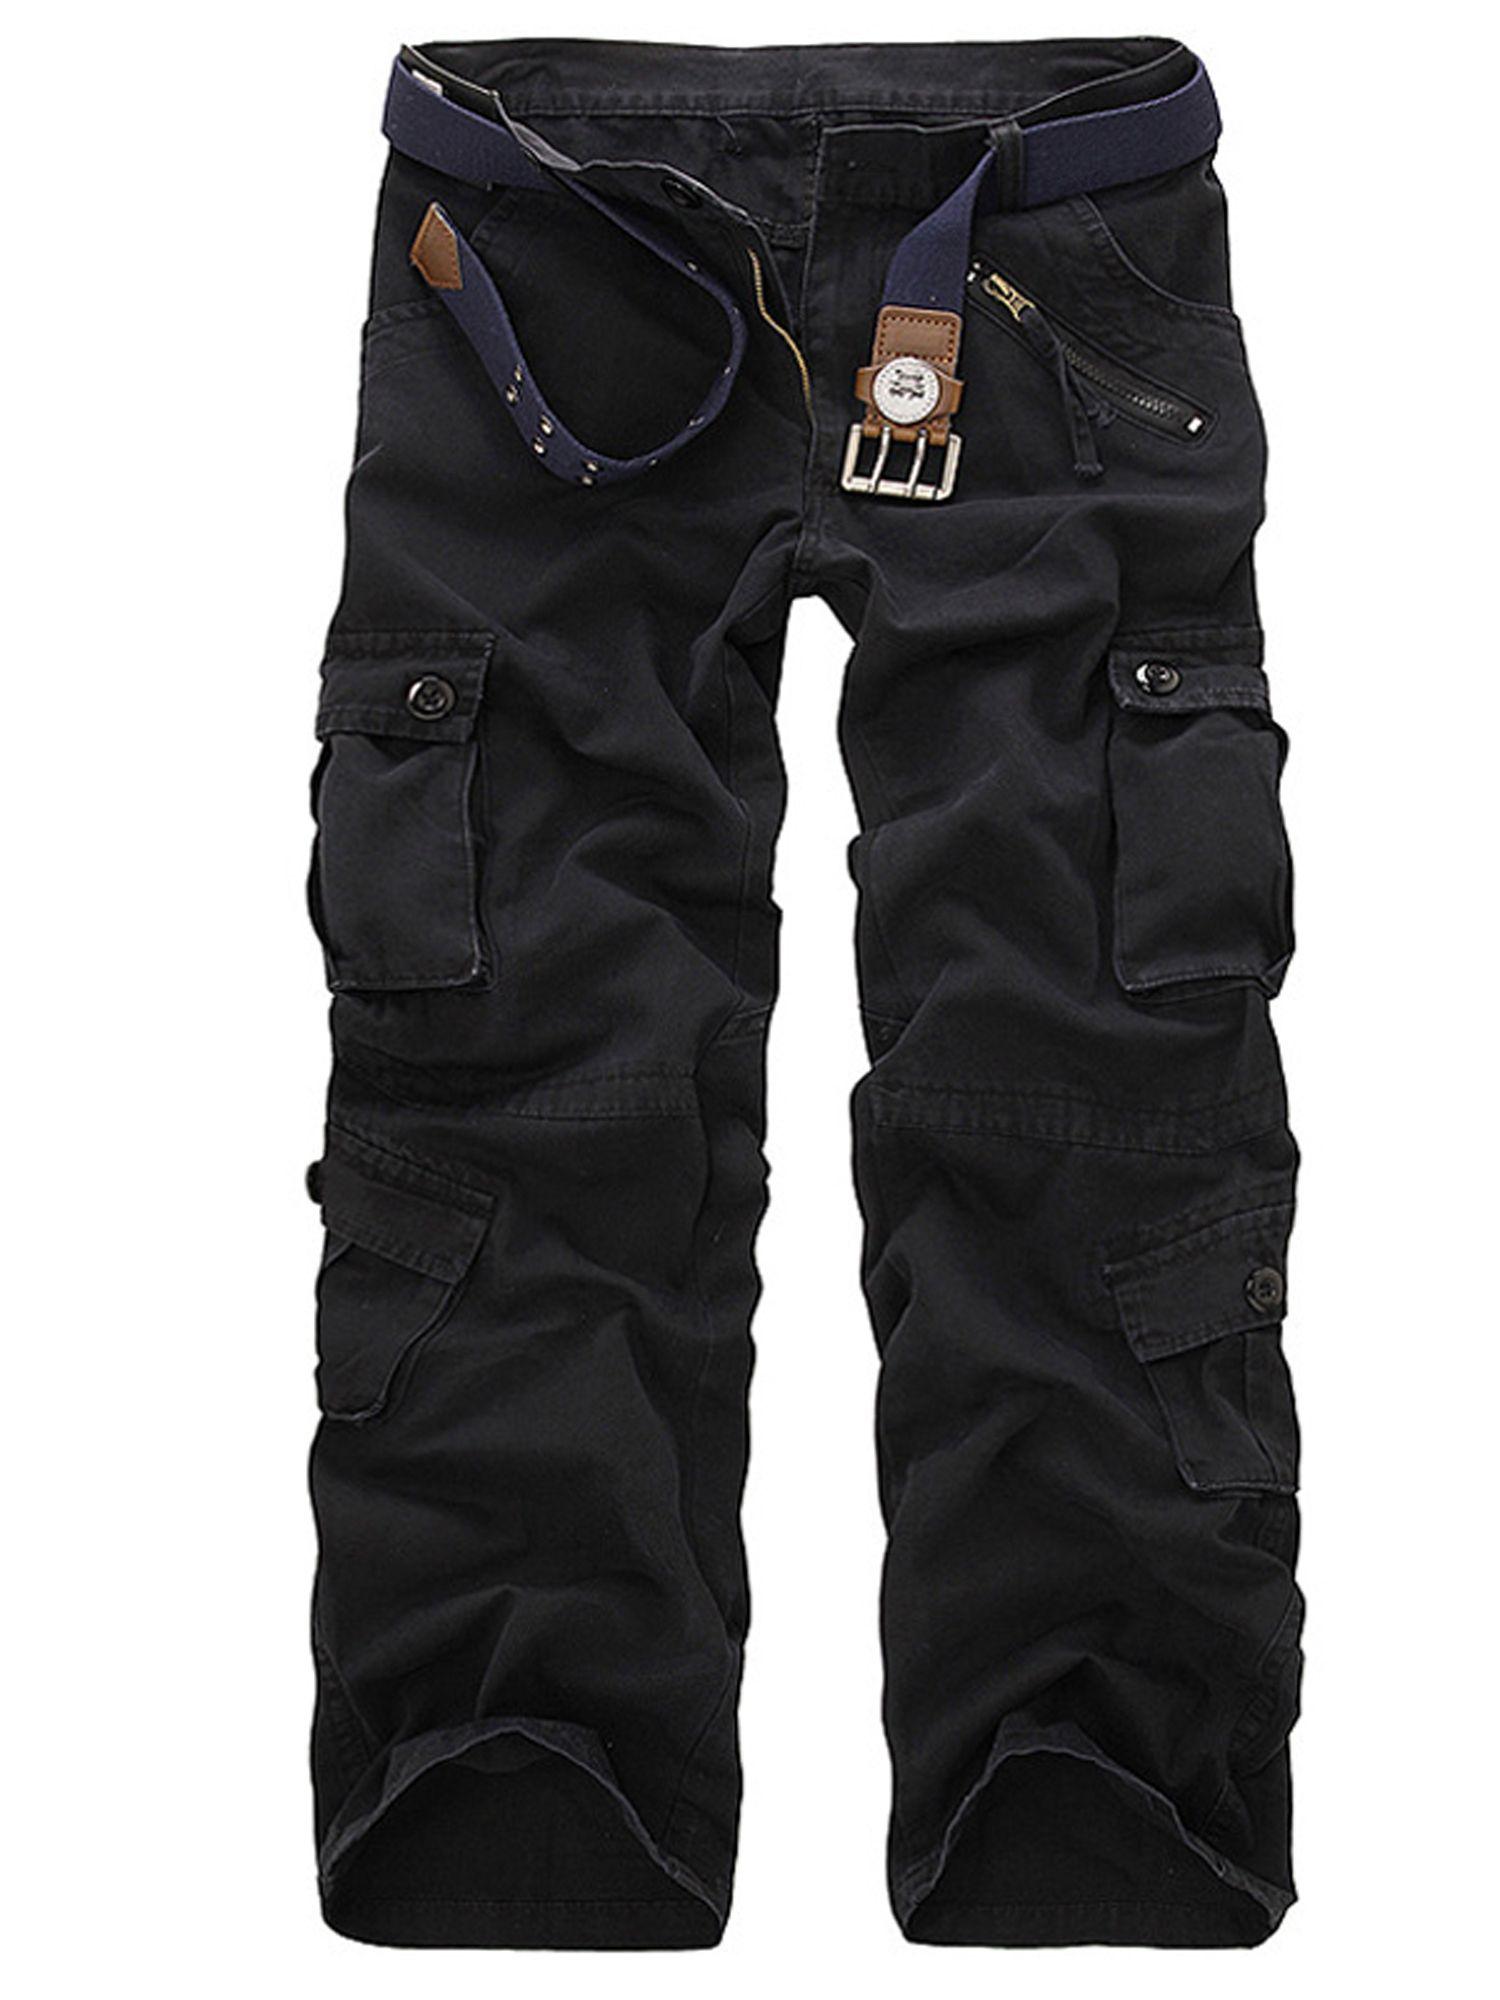 Lallc Men S Cargo Work Trousers Army Military Combat Multi Pockets Loose Cotton Pants Walmart Com In 2021 Cargo Pants Men Mens Casual Cargo Pants Camouflage Cargo Pants [ 2000 x 1500 Pixel ]